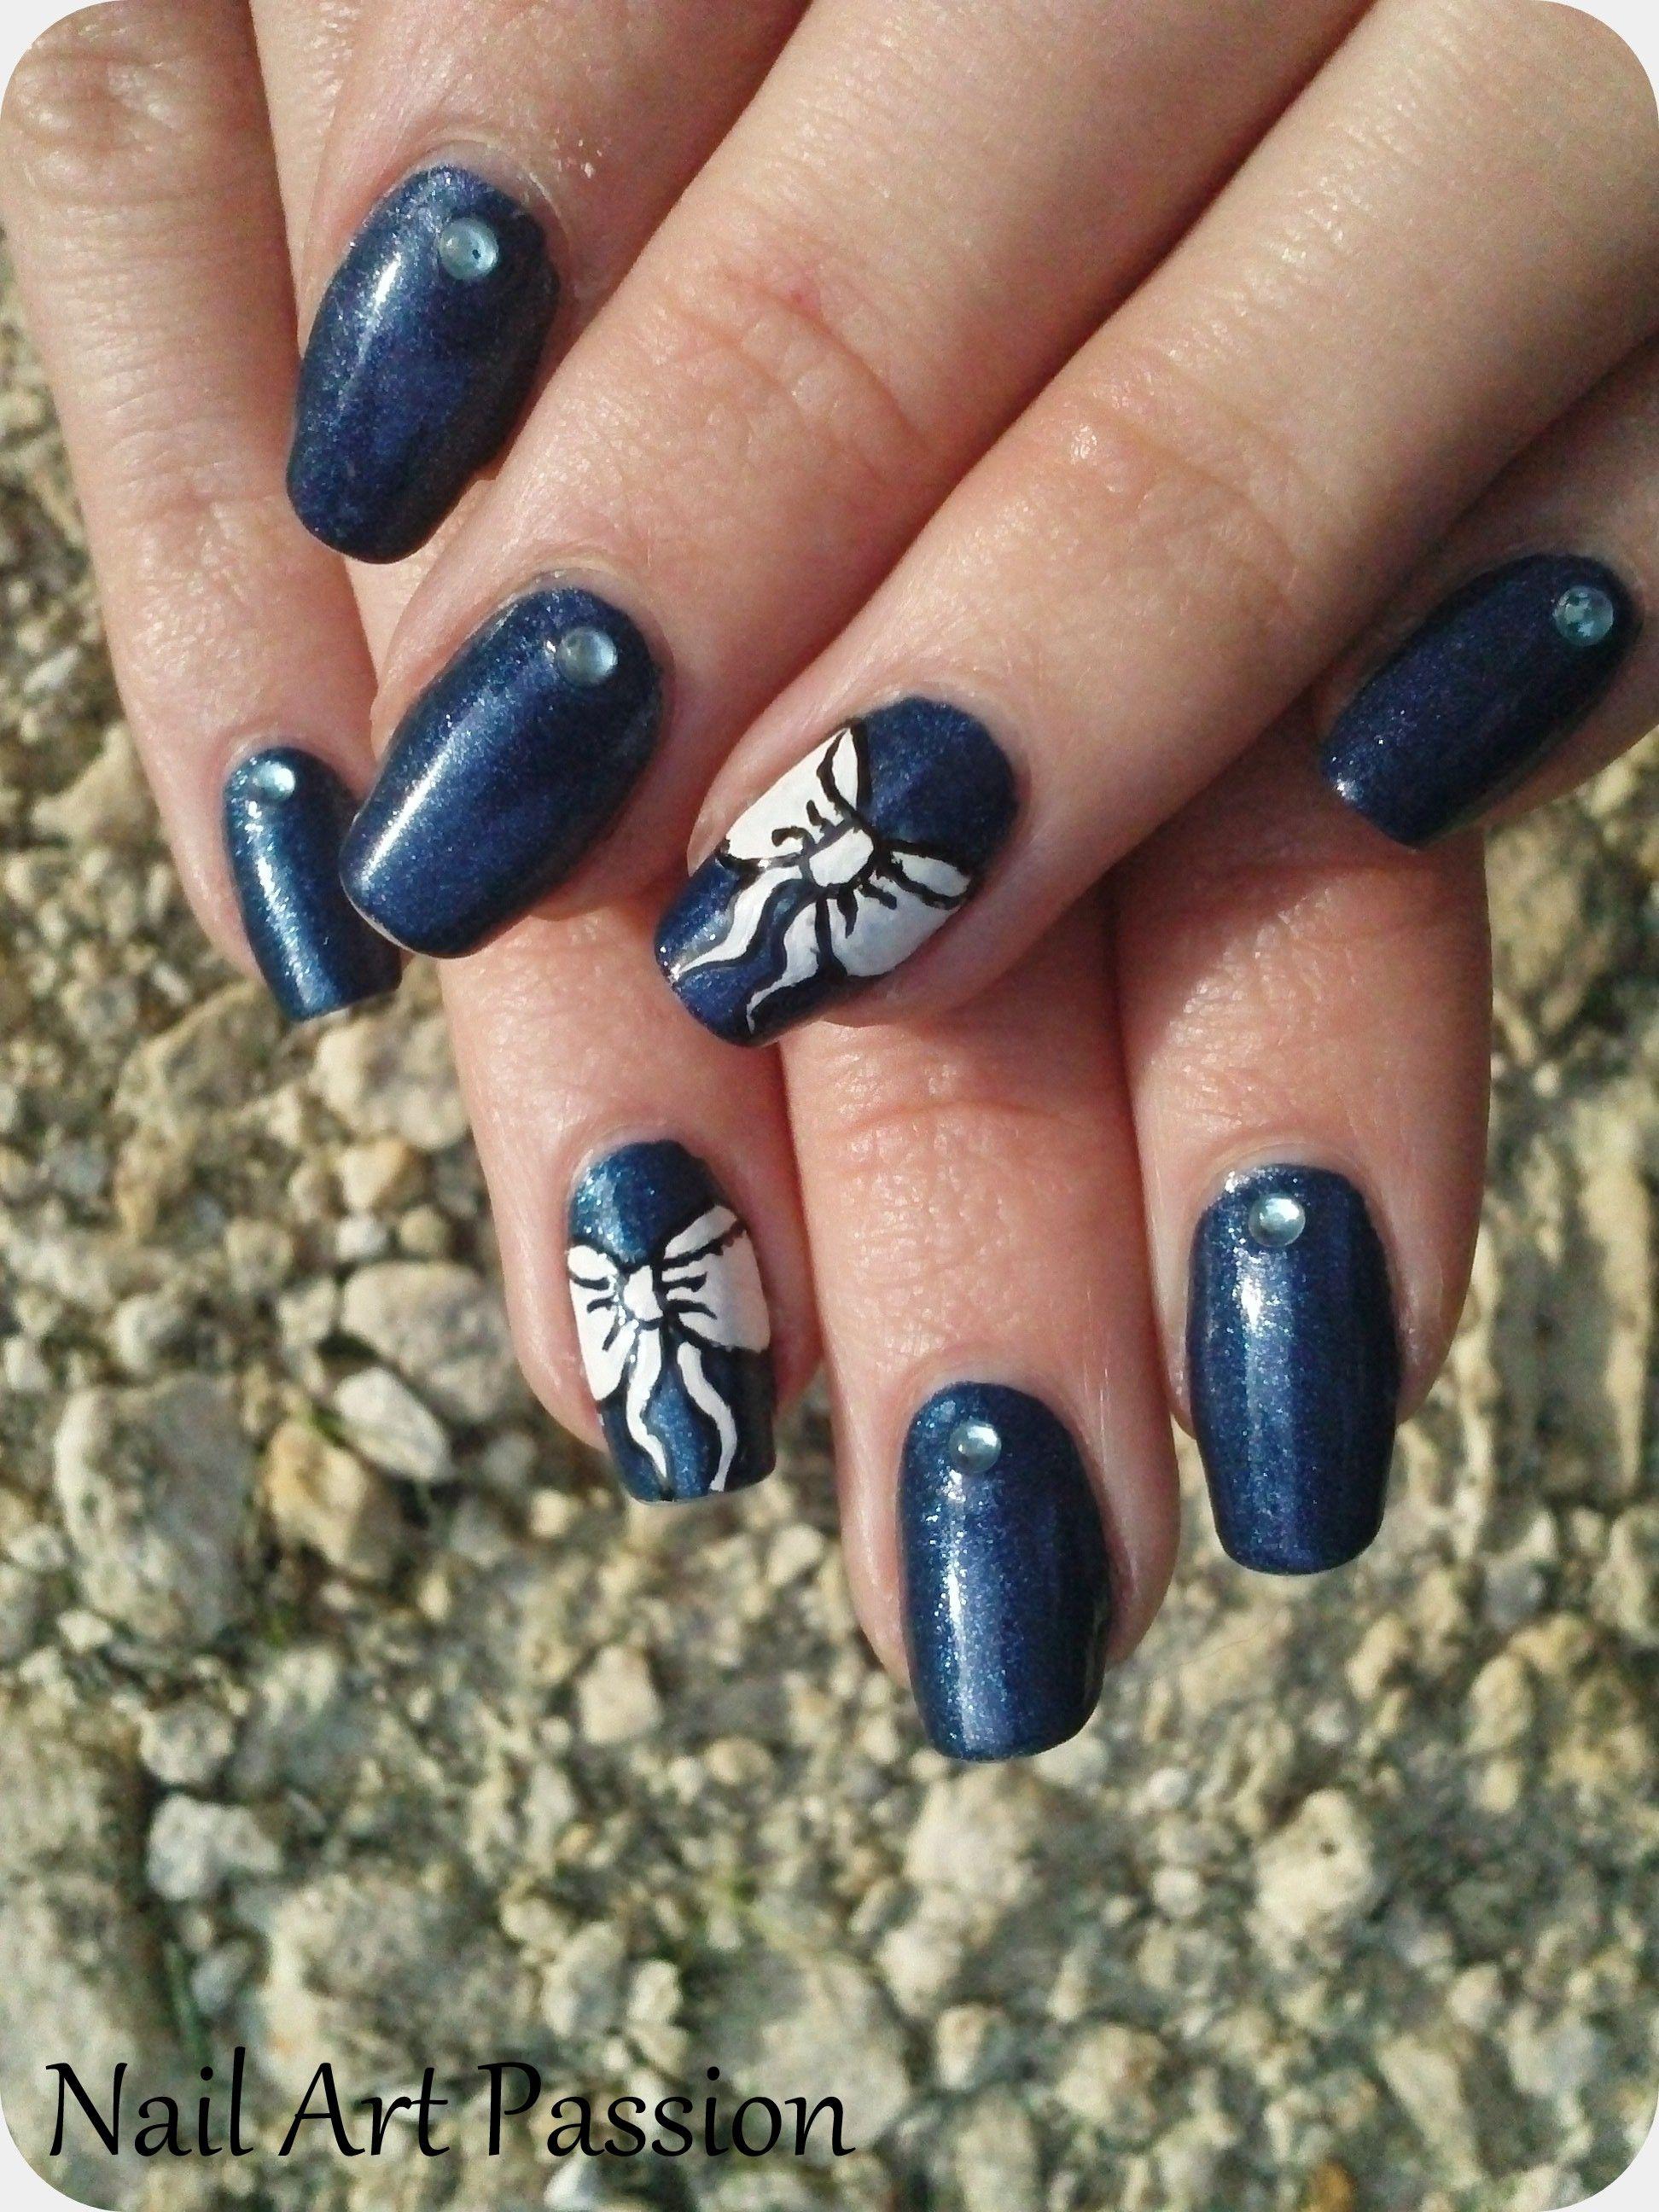 http://nail-art-passion.eklablog.fr/nail-art-bleu-jean-et-noeuds-a105684614